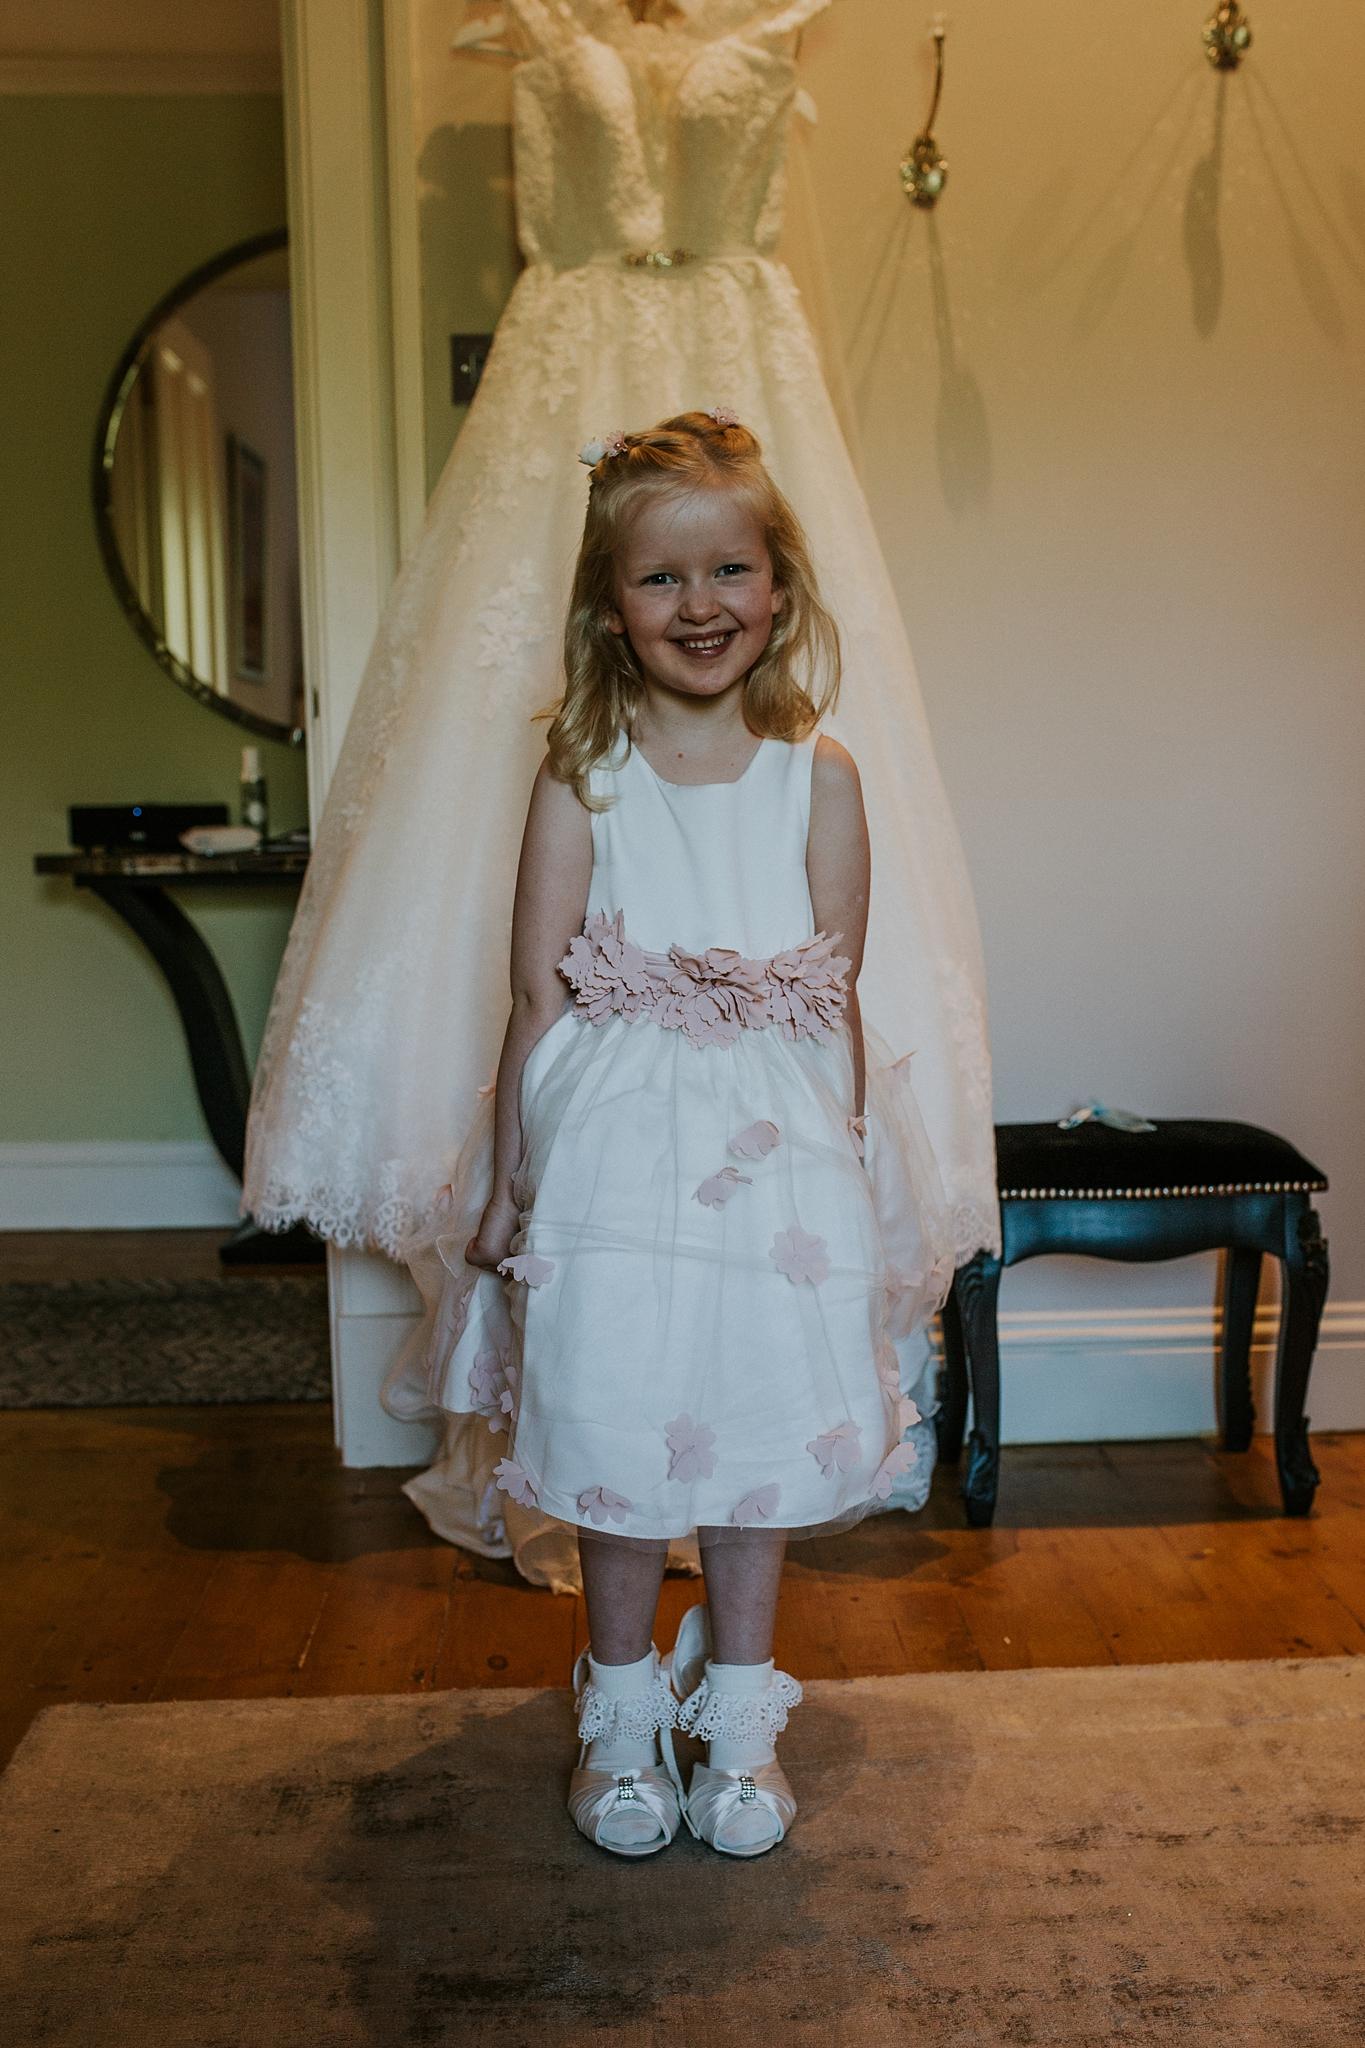 Mark_Alison_Pollockshields_Burgh_Hall_Wedding-7.JPG